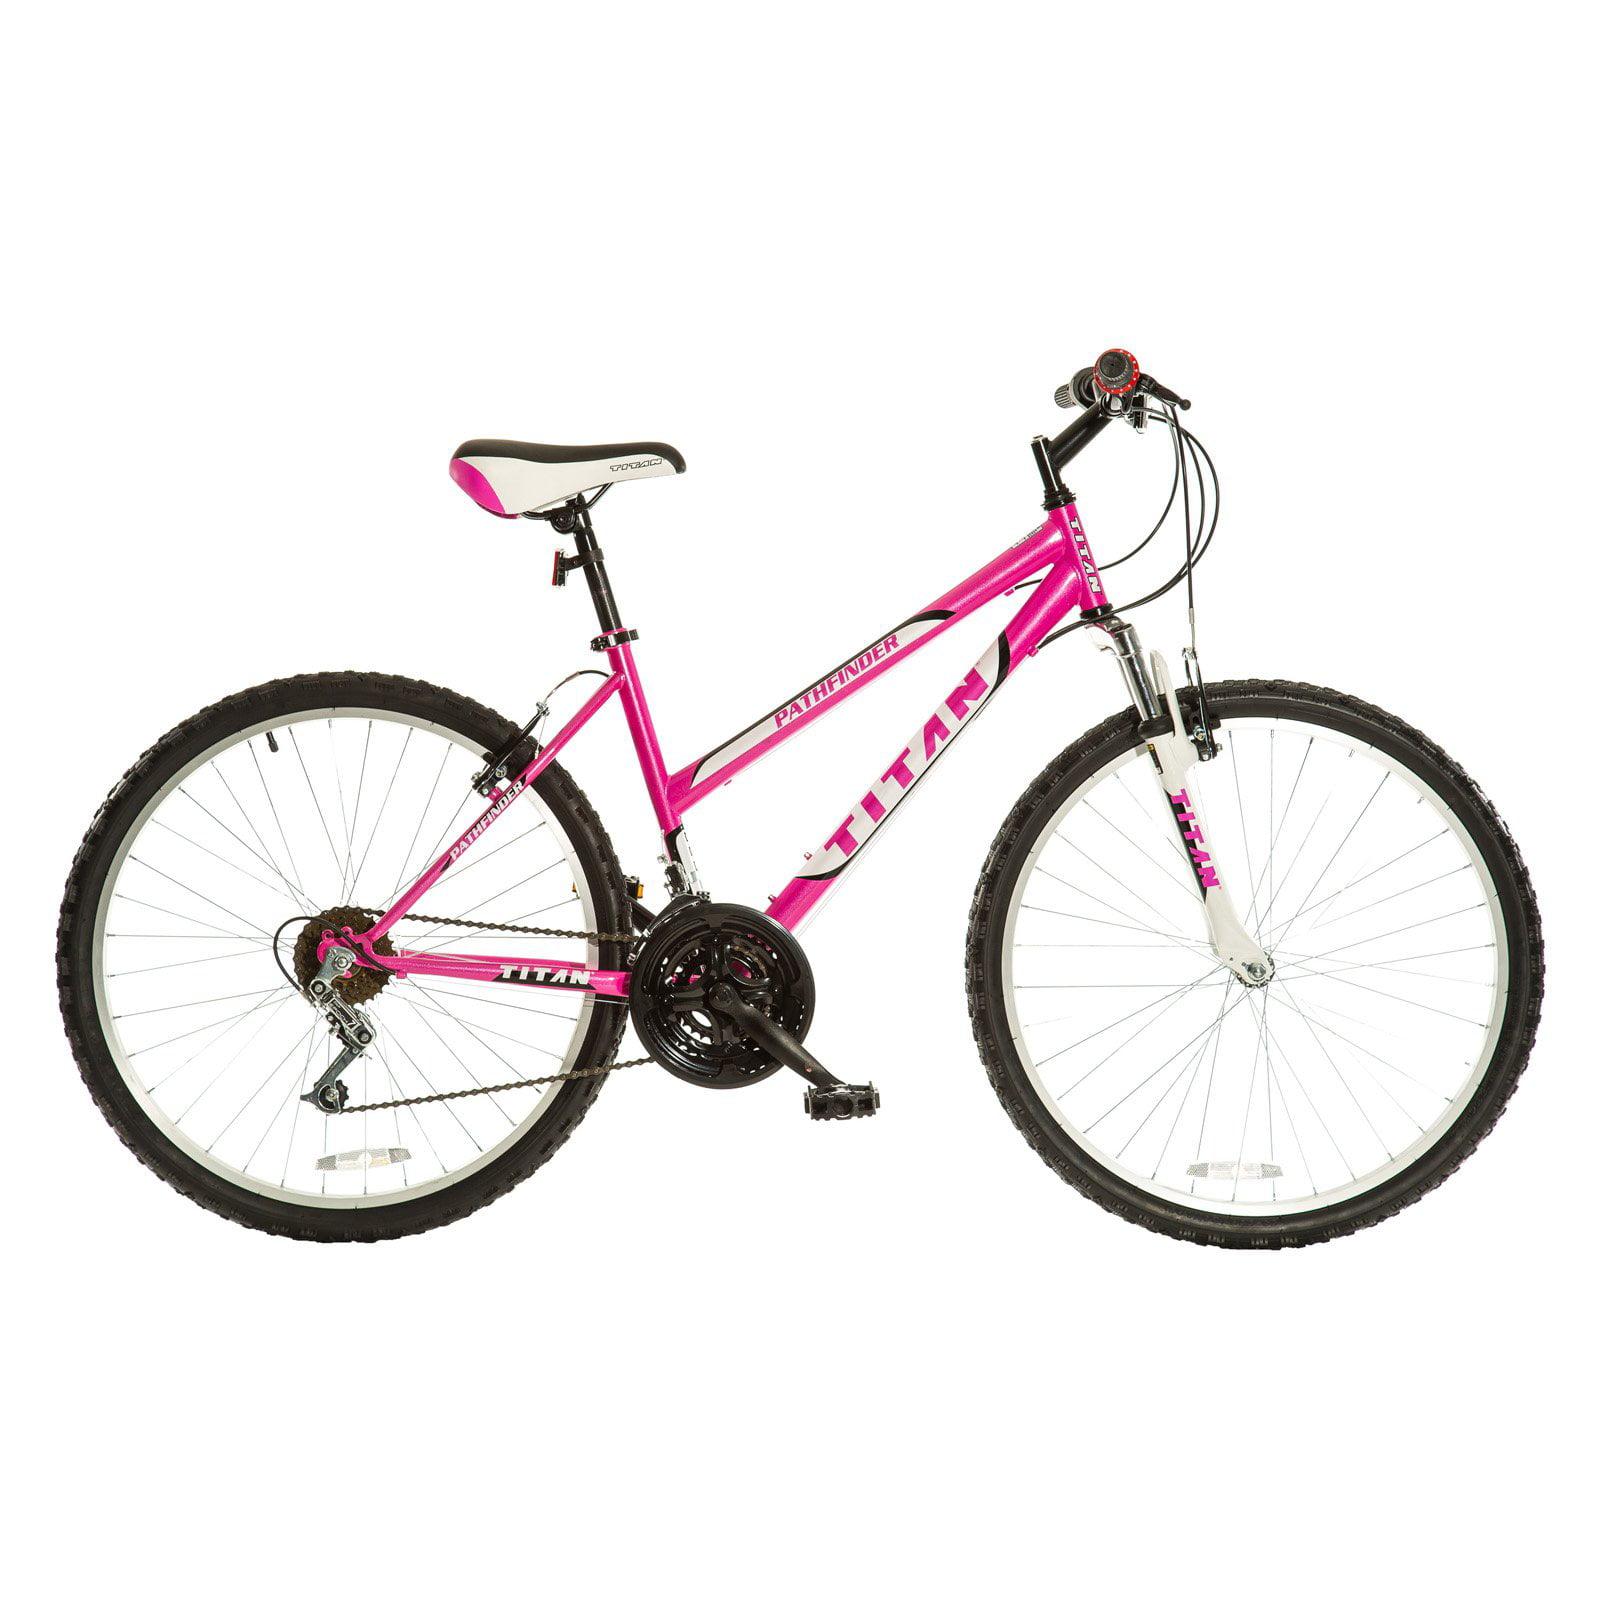 Titan Pathfinder Women's 18-Speed Suspension Mountain Bike, Hot Pink